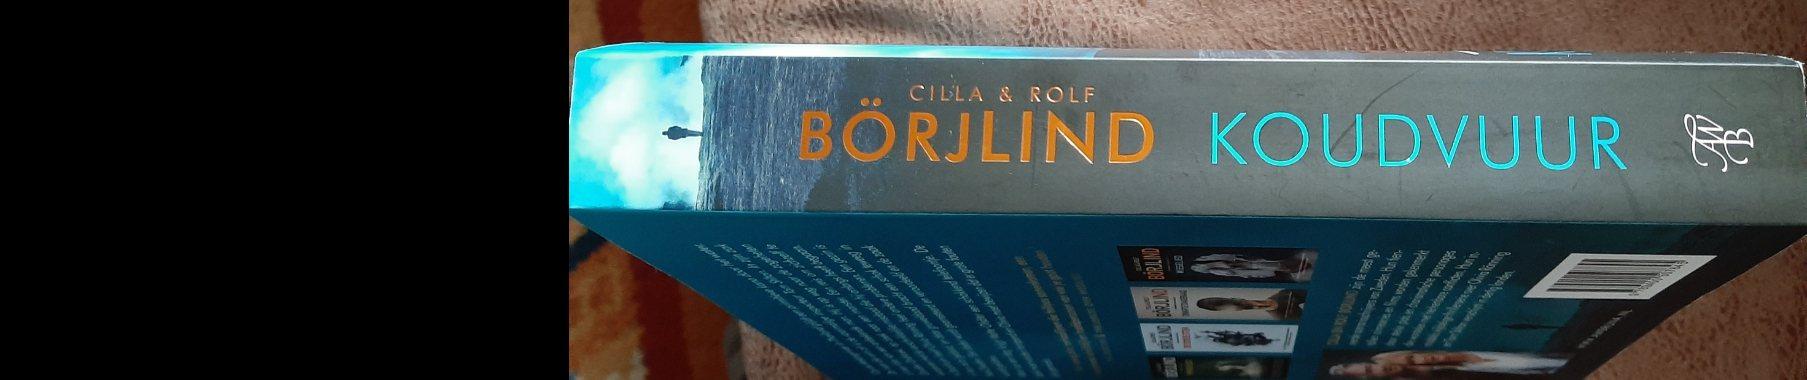 Boekrecensie: Koudvuur, Cilla en Rolf Börjlind. | cillaenrolfborjlind | koudvuur | ronningenstiltonthriller | awbruna | uitgeverijawbruna | borjlind | scandinavischethriller